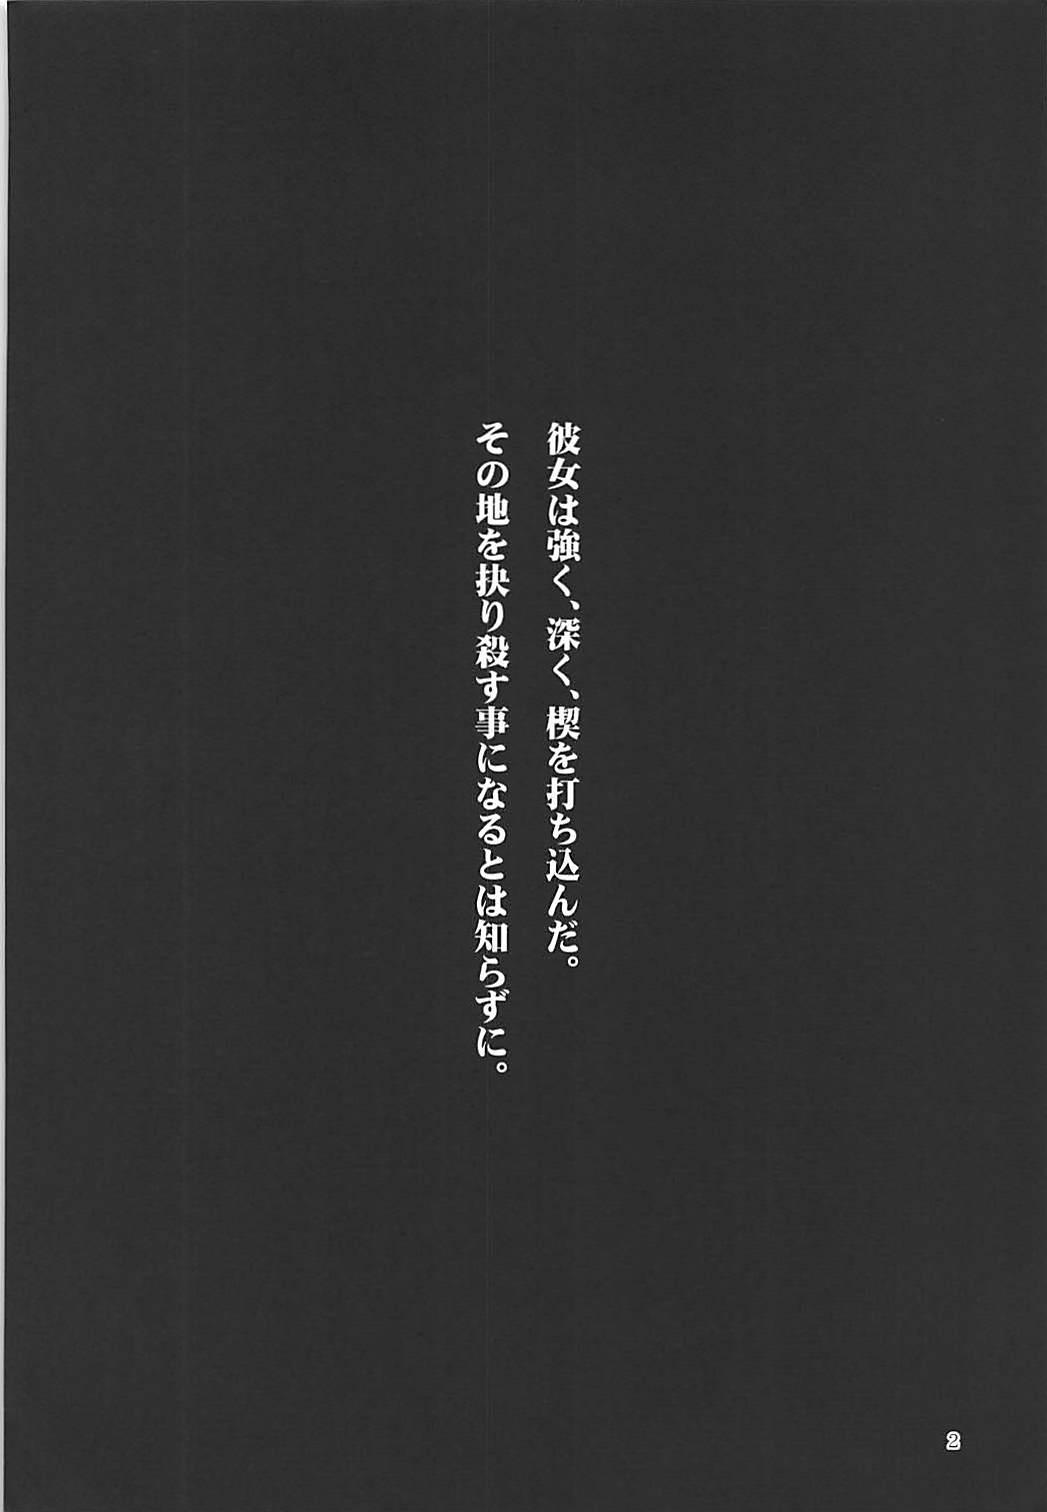 Hakumayo Schedule AM 2